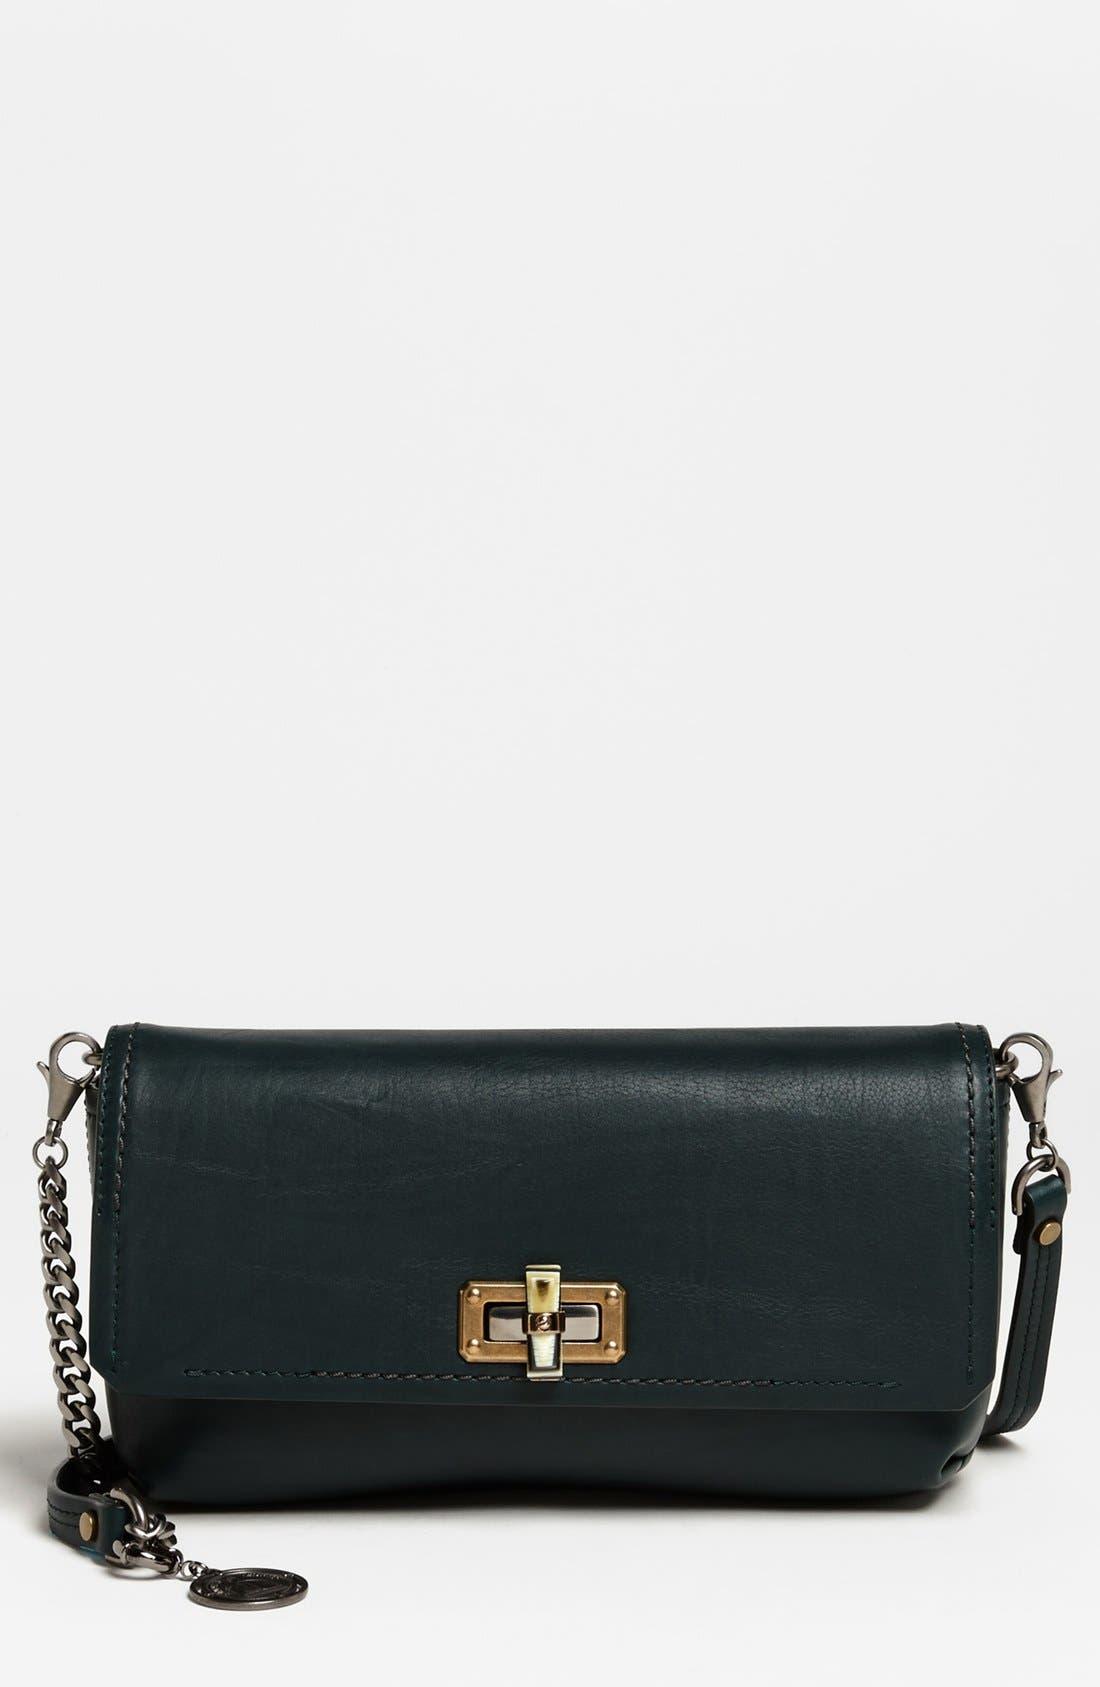 Main Image - Lanvin 'Happy' Leather Crossbody Bag